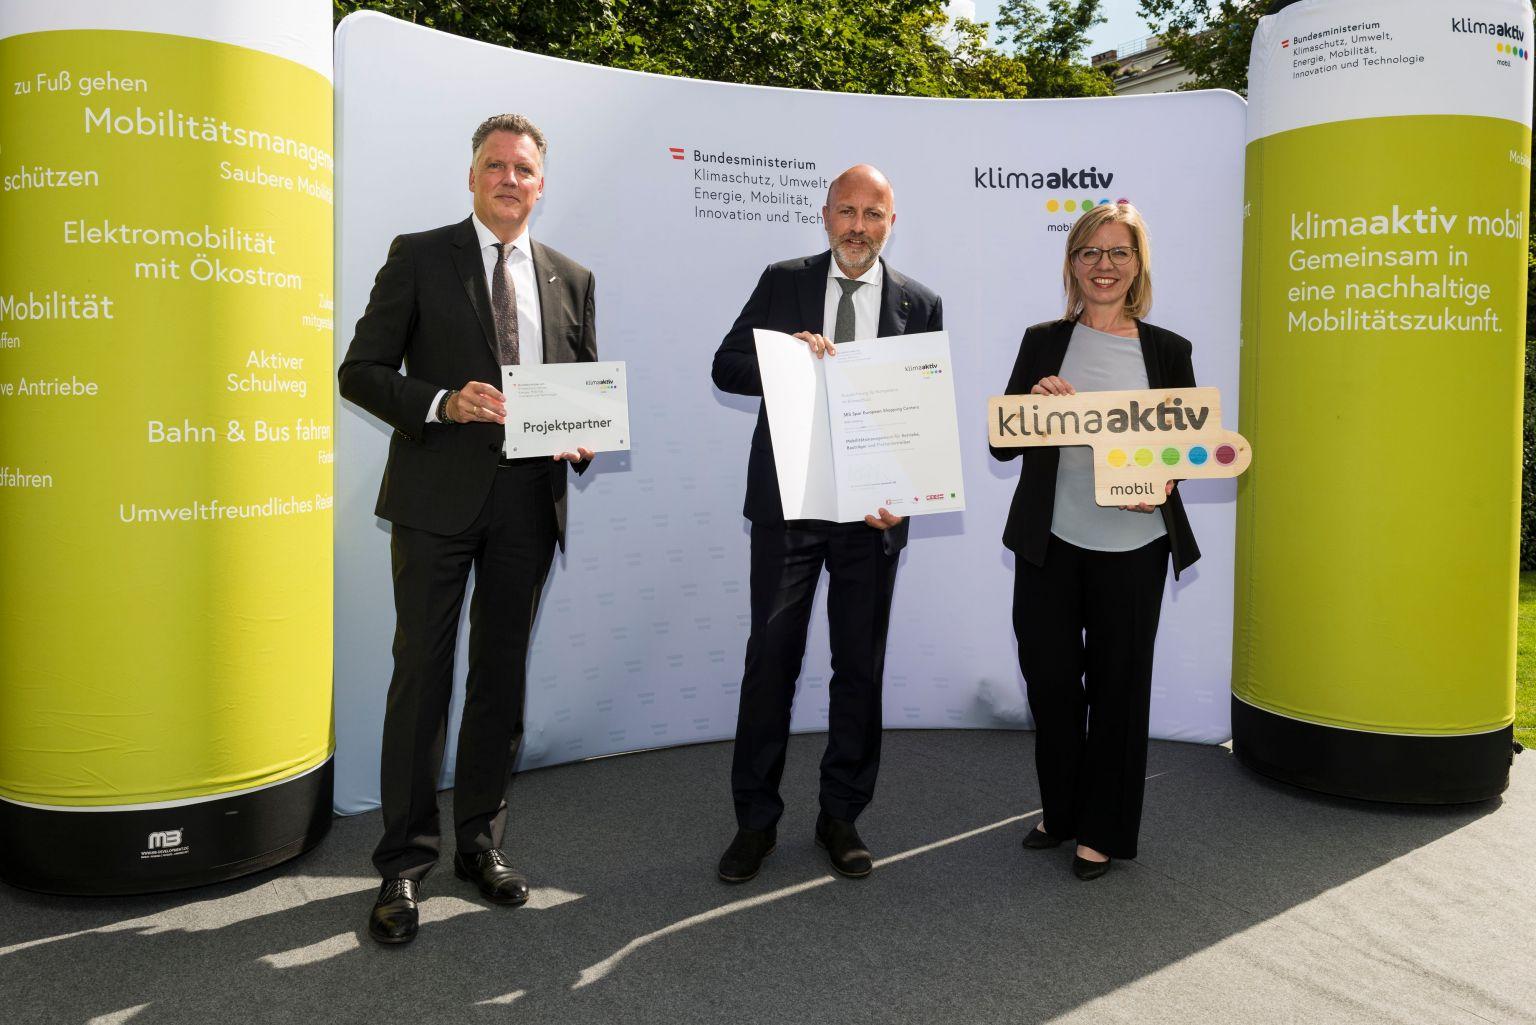 """klimaaktiv mobil-Projektpartner"": SES erhält Auszeichnung"